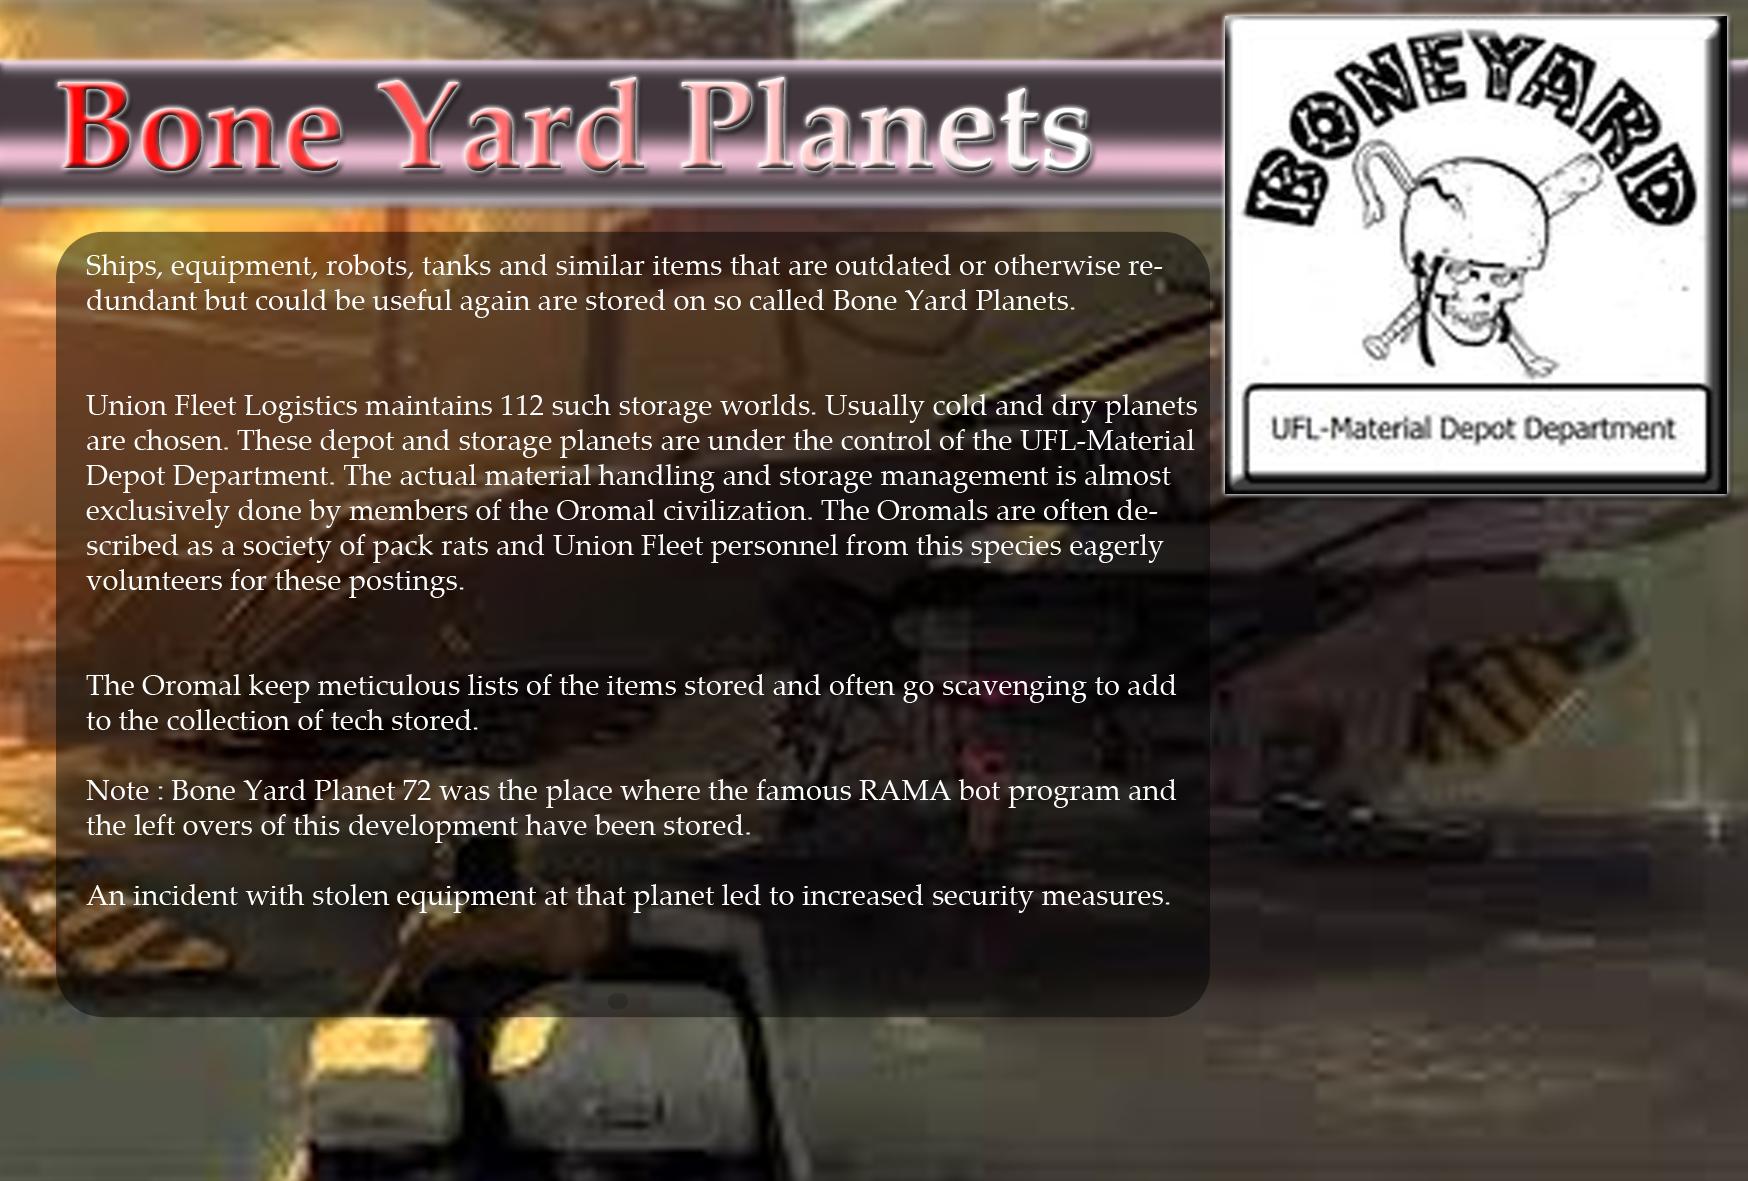 Bone Yard Planets